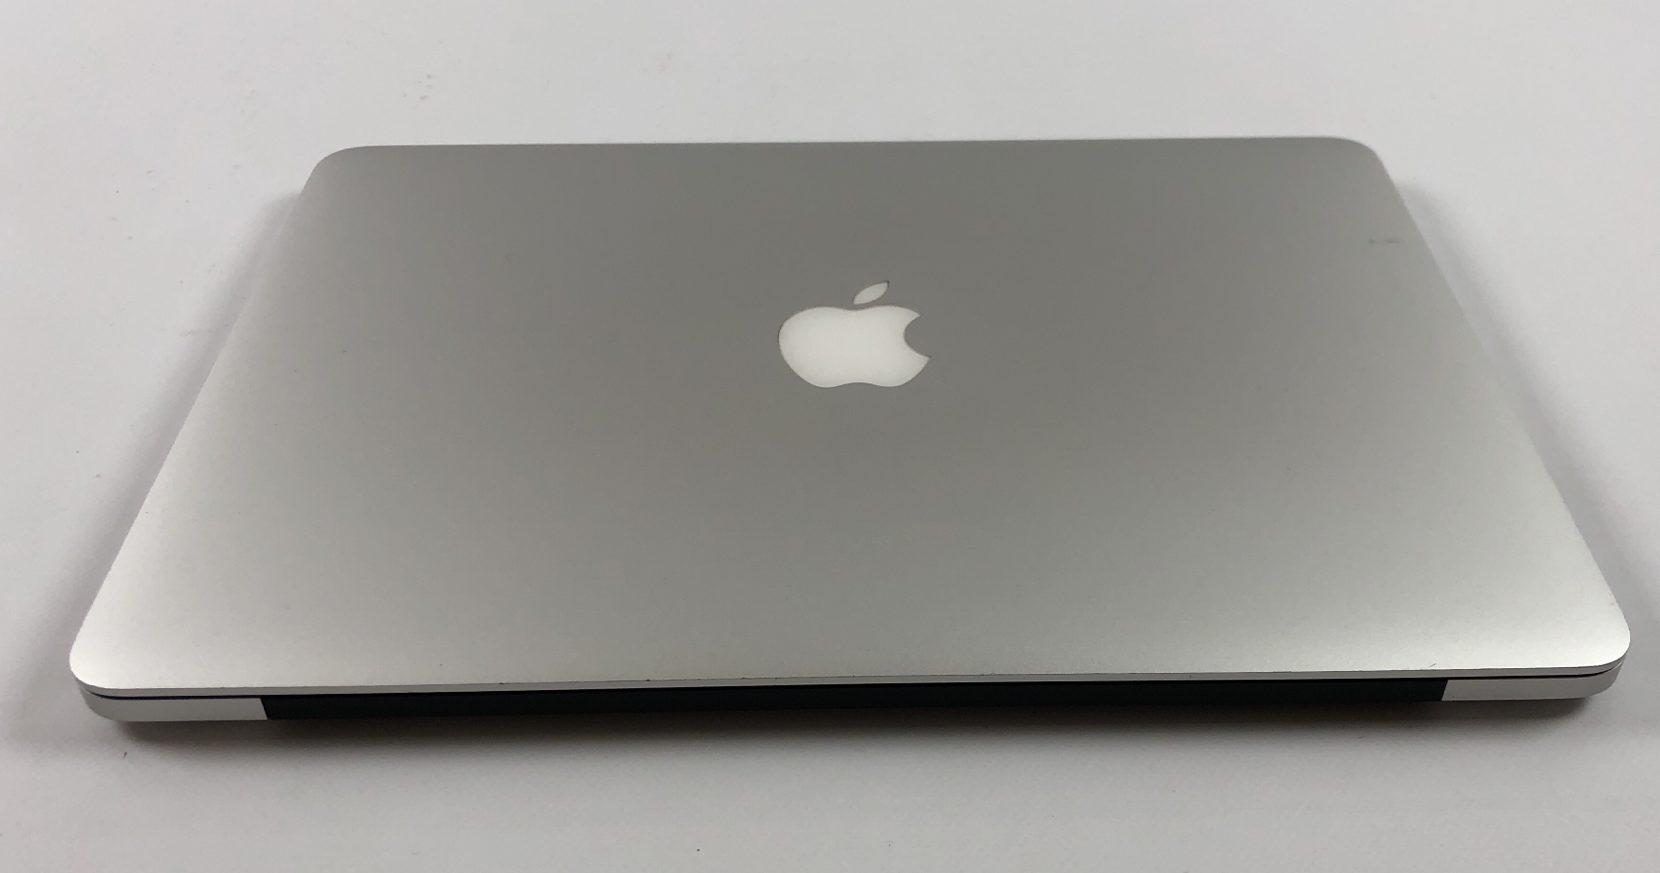 "MacBook Pro Retina 13"" Early 2015 (Intel Core i5 2.7 GHz 8 GB RAM 256 GB SSD), Intel Core i5 2.7 GHz, 8 GB RAM, 256 GB SSD, image 2"